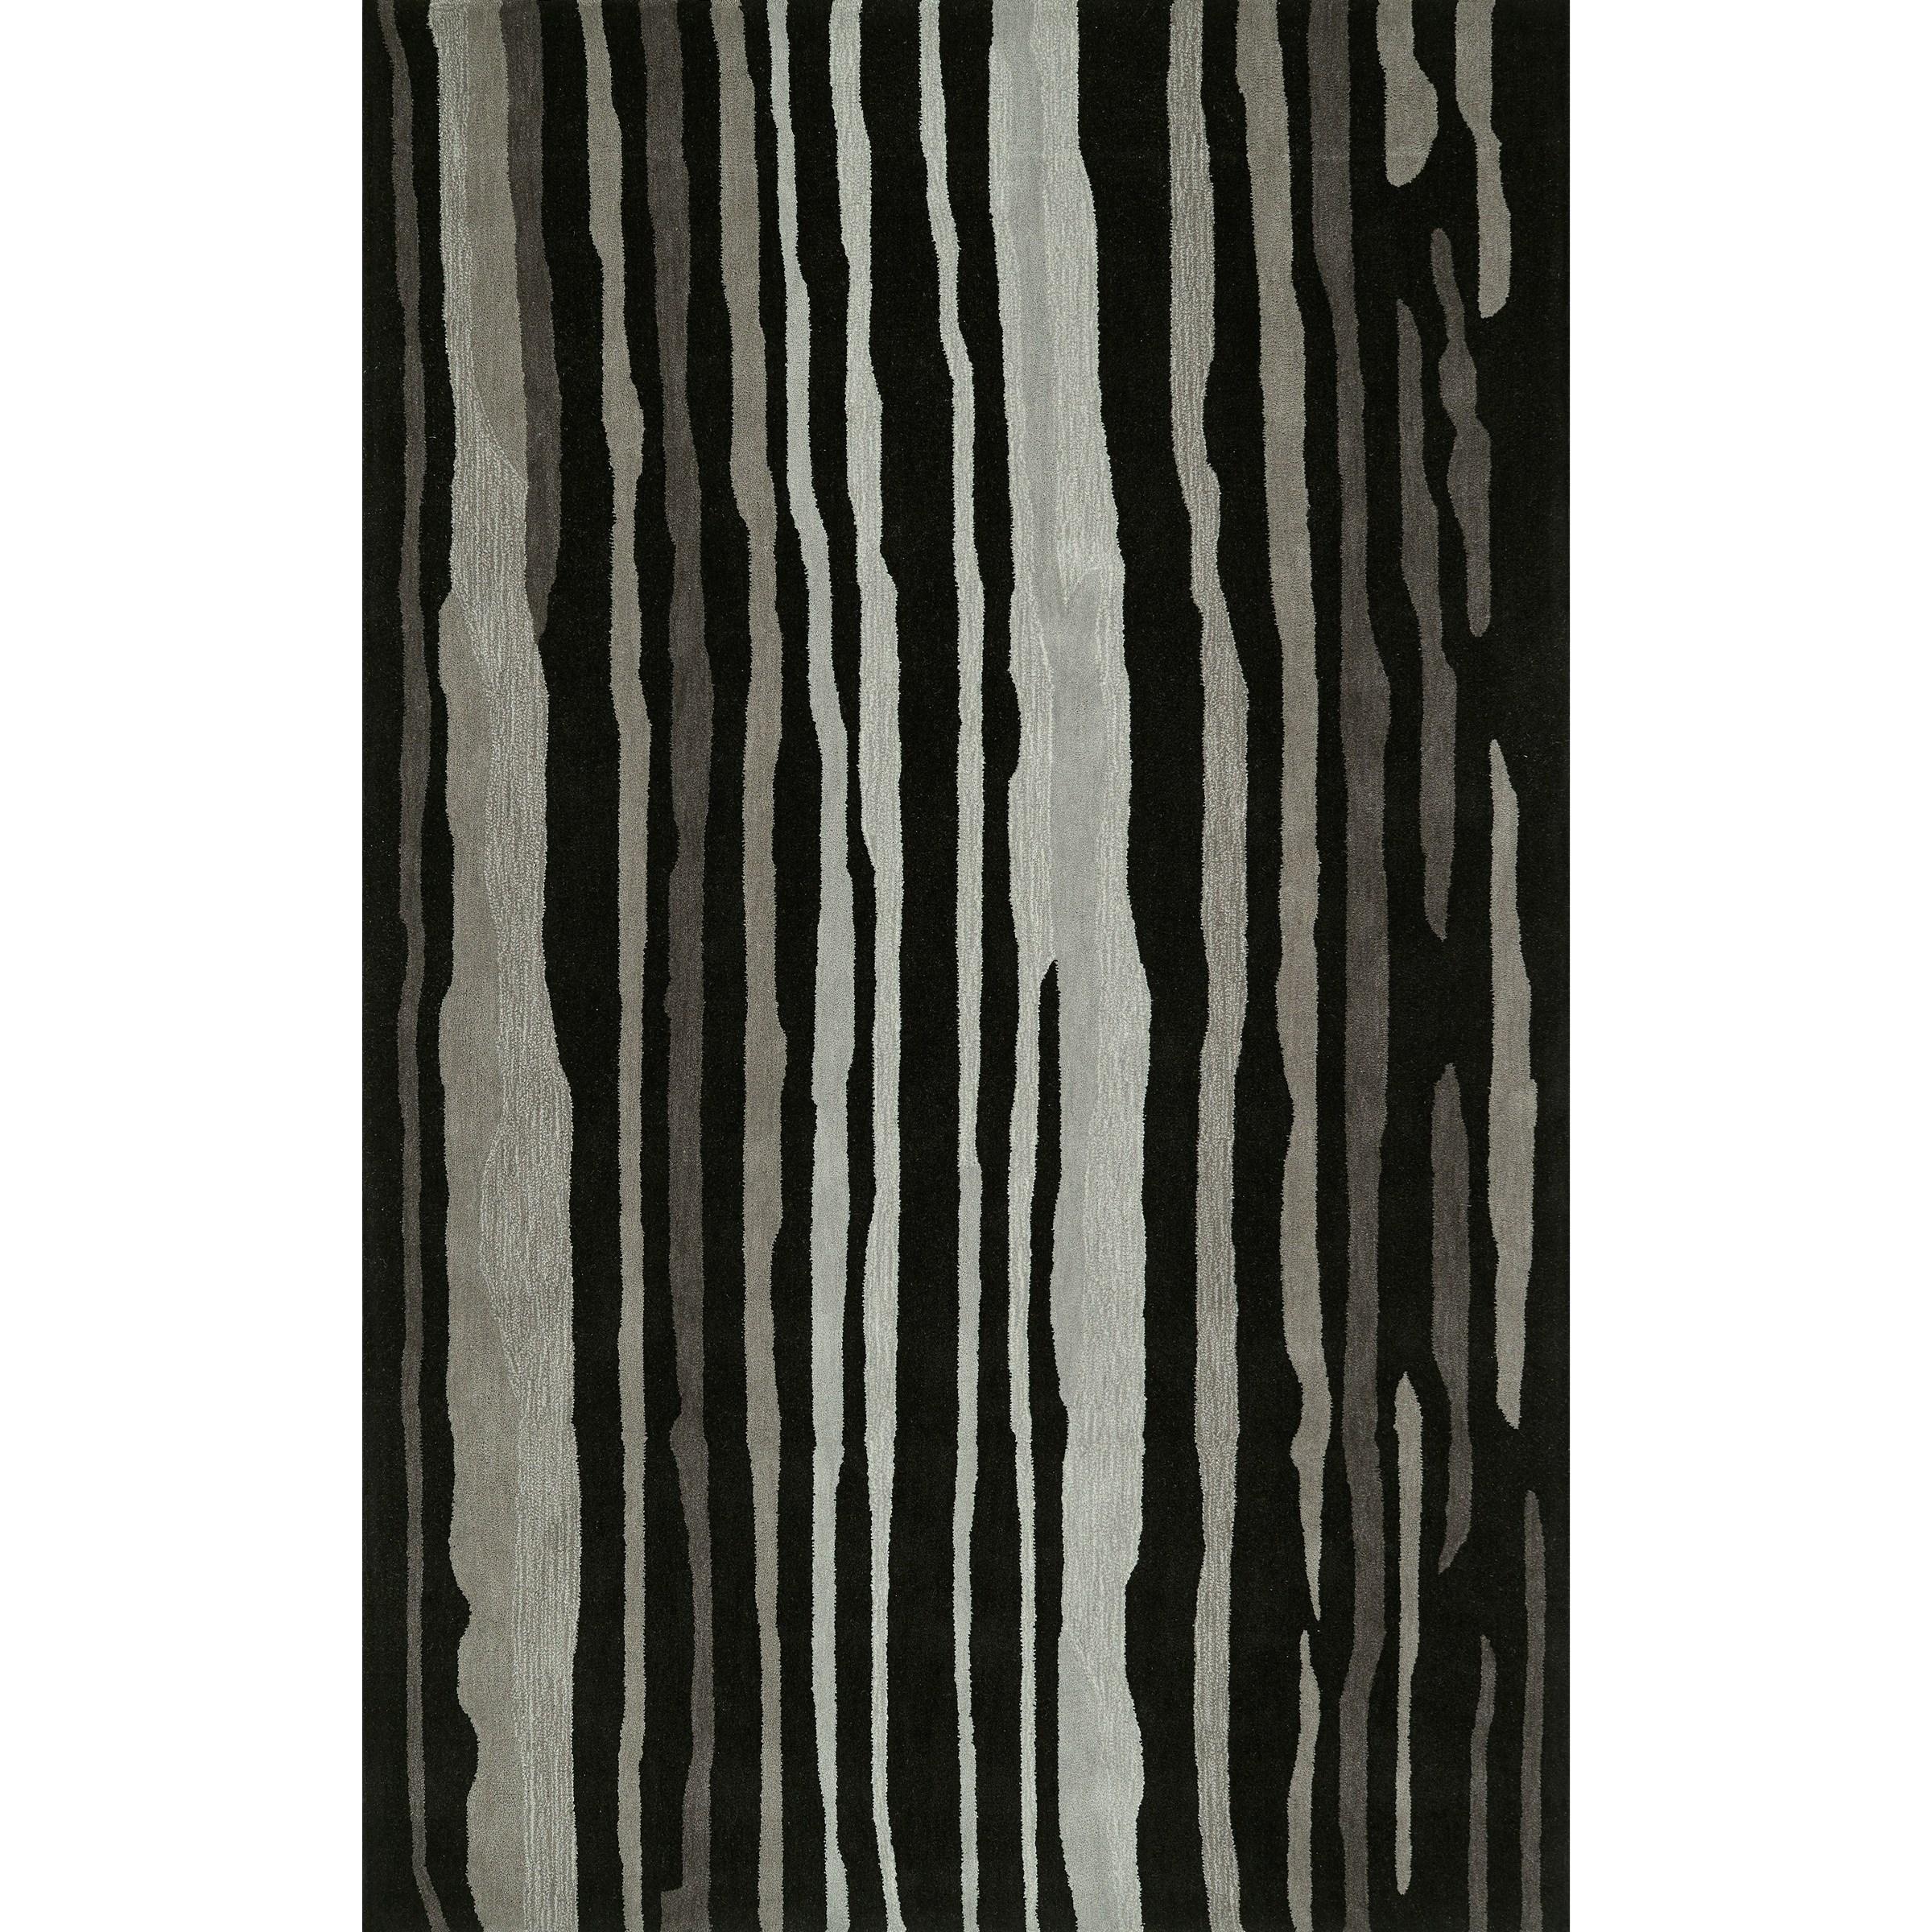 Journey Black 9' x 13' Rug by Dalyn at Fashion Furniture